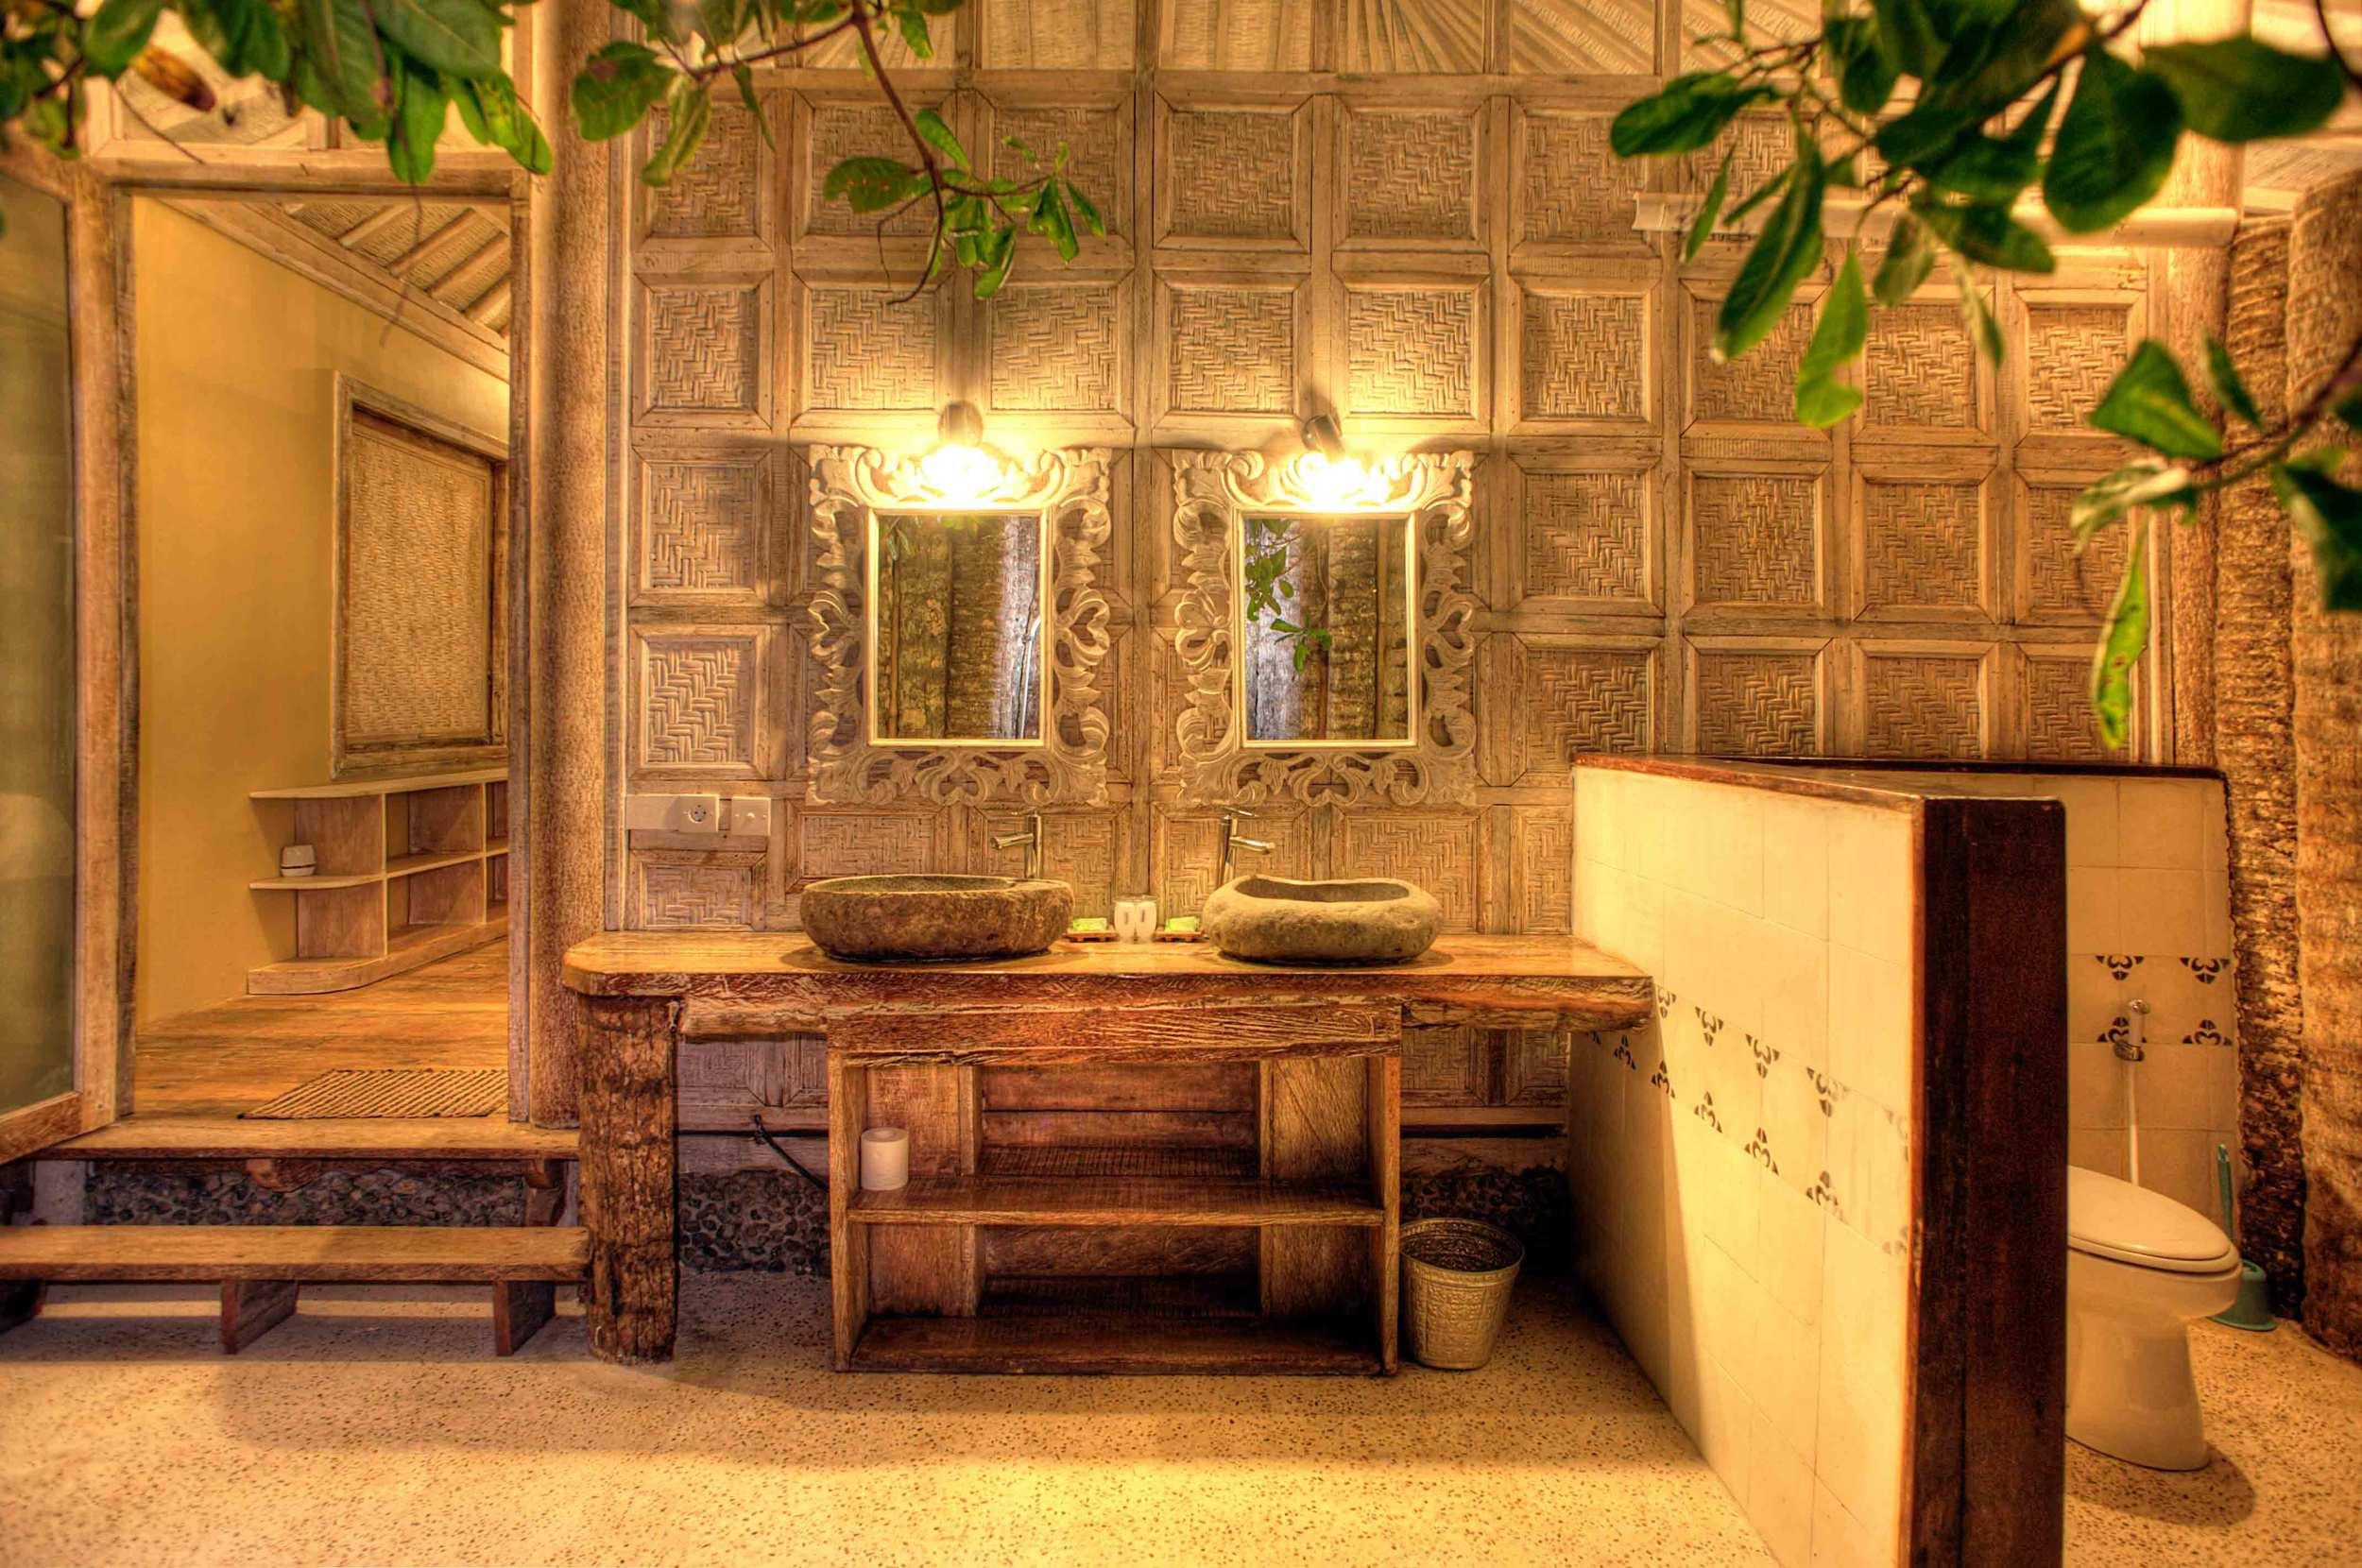 Exterior bathroom Villa 2 bedrooms by night - Les Villas Ottalia